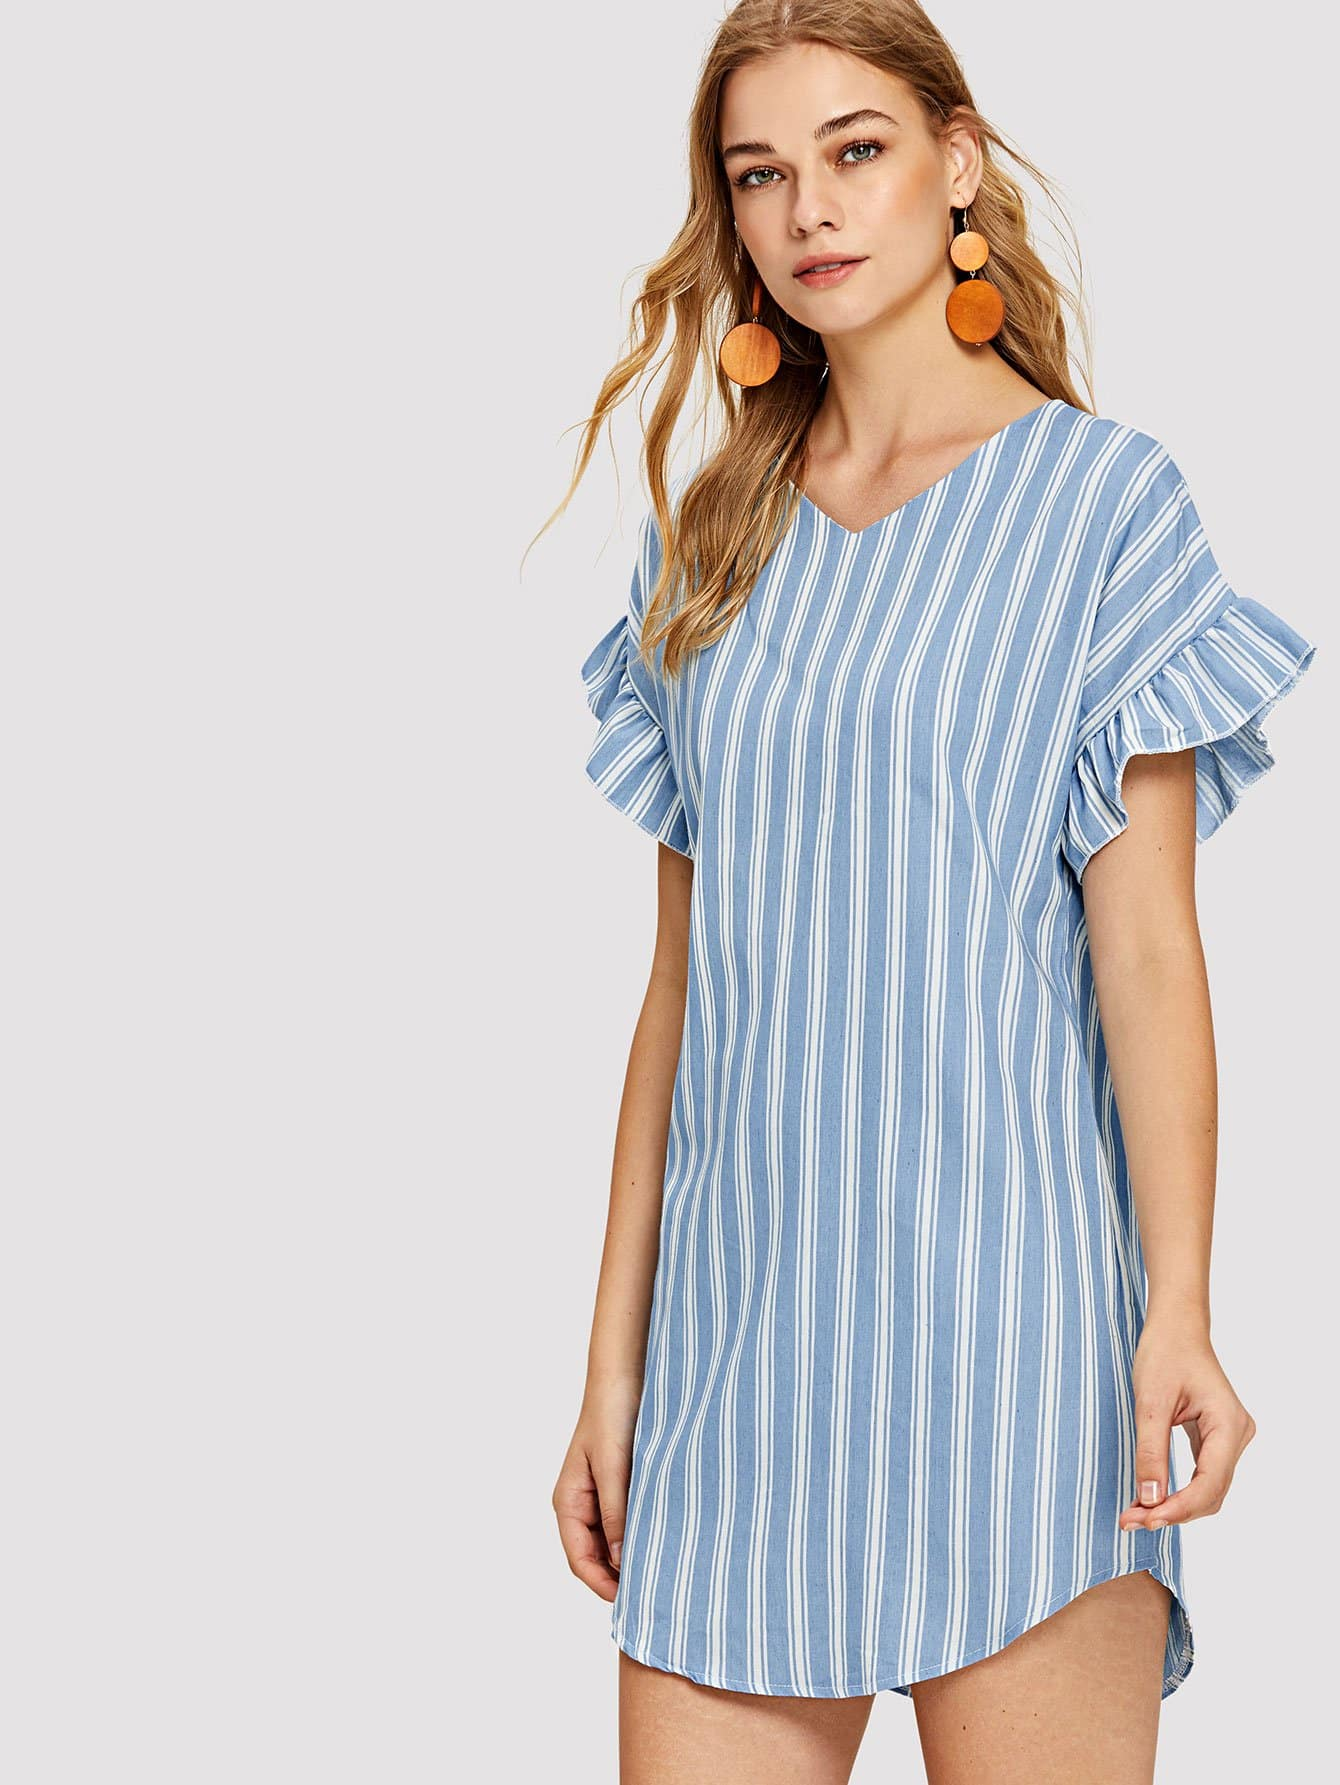 Flounce Sleeve Striped Denim Dress flounce sleeve striped denim dress